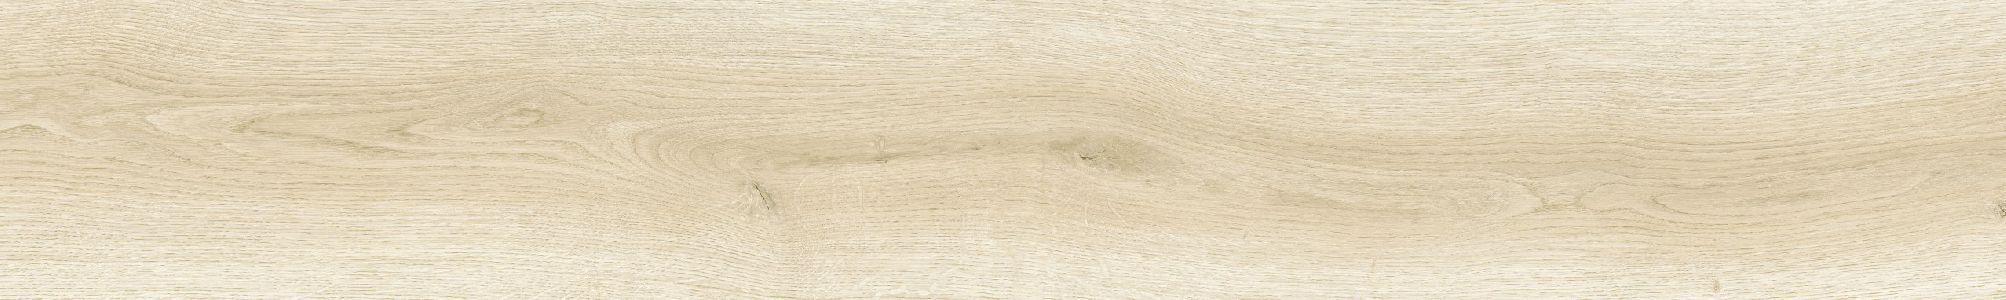 Виниловый ламинат Fine Floor - Light Дуб Кларе